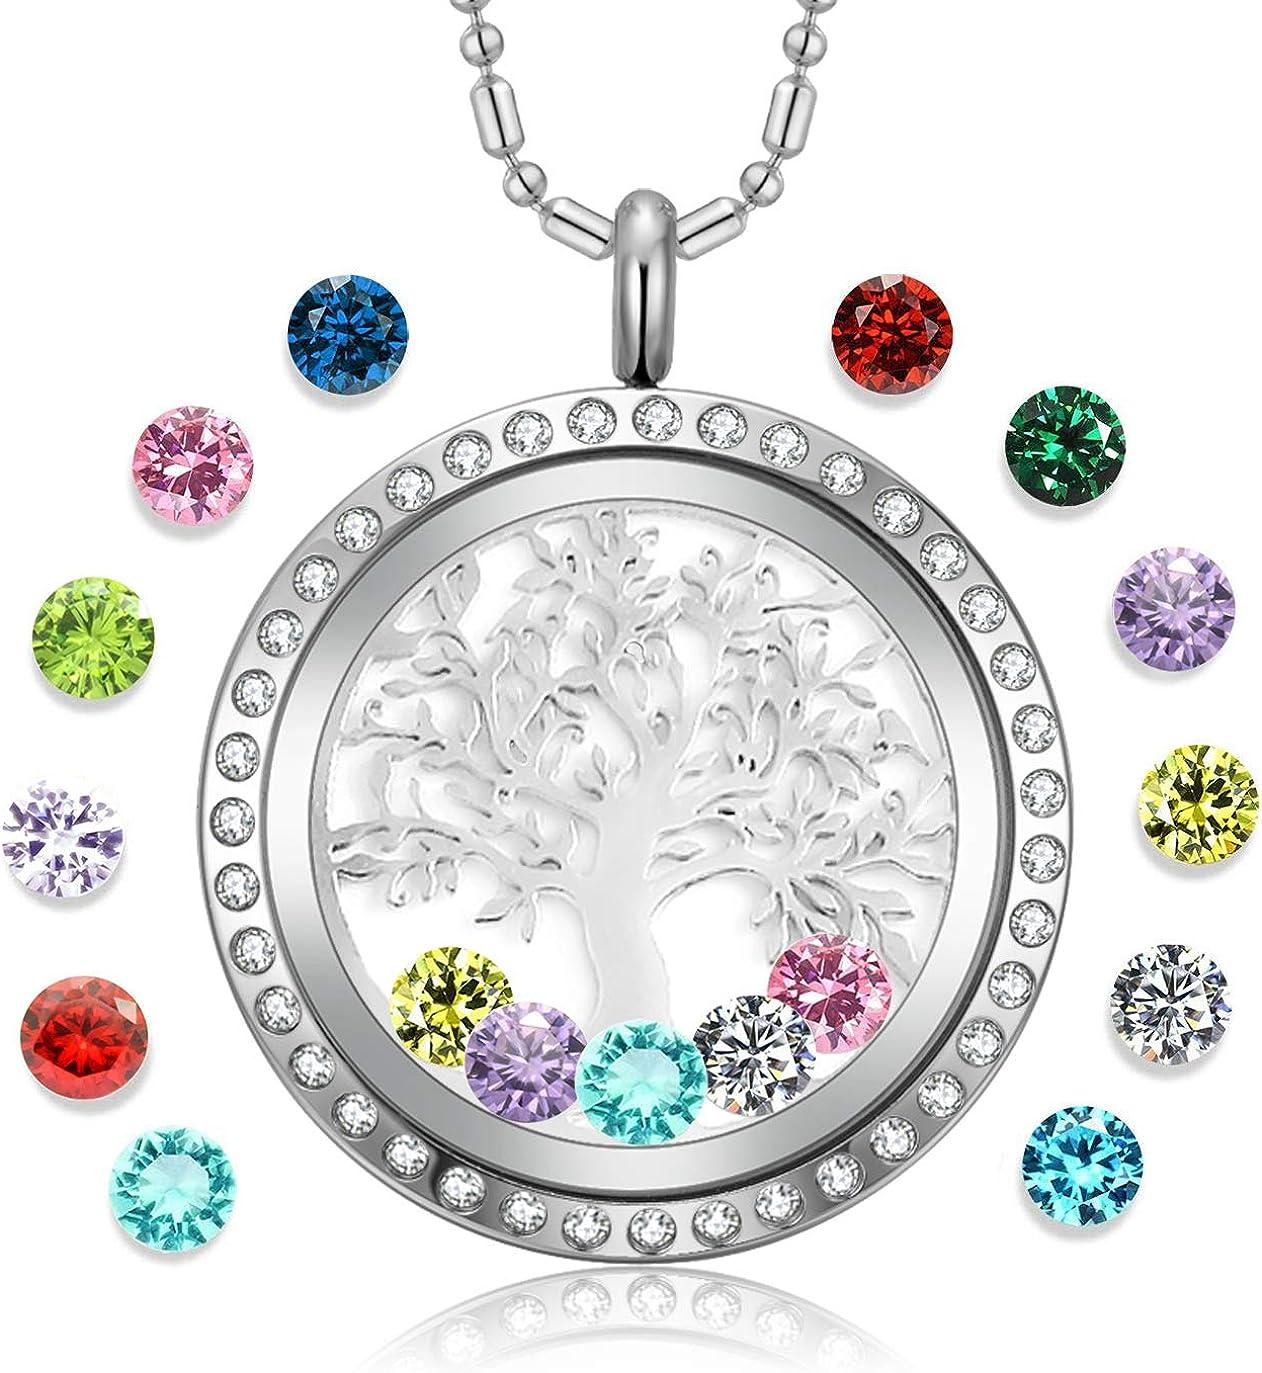 BABY Girl daughter floating charm for glass memory locket new mum jewellery gift